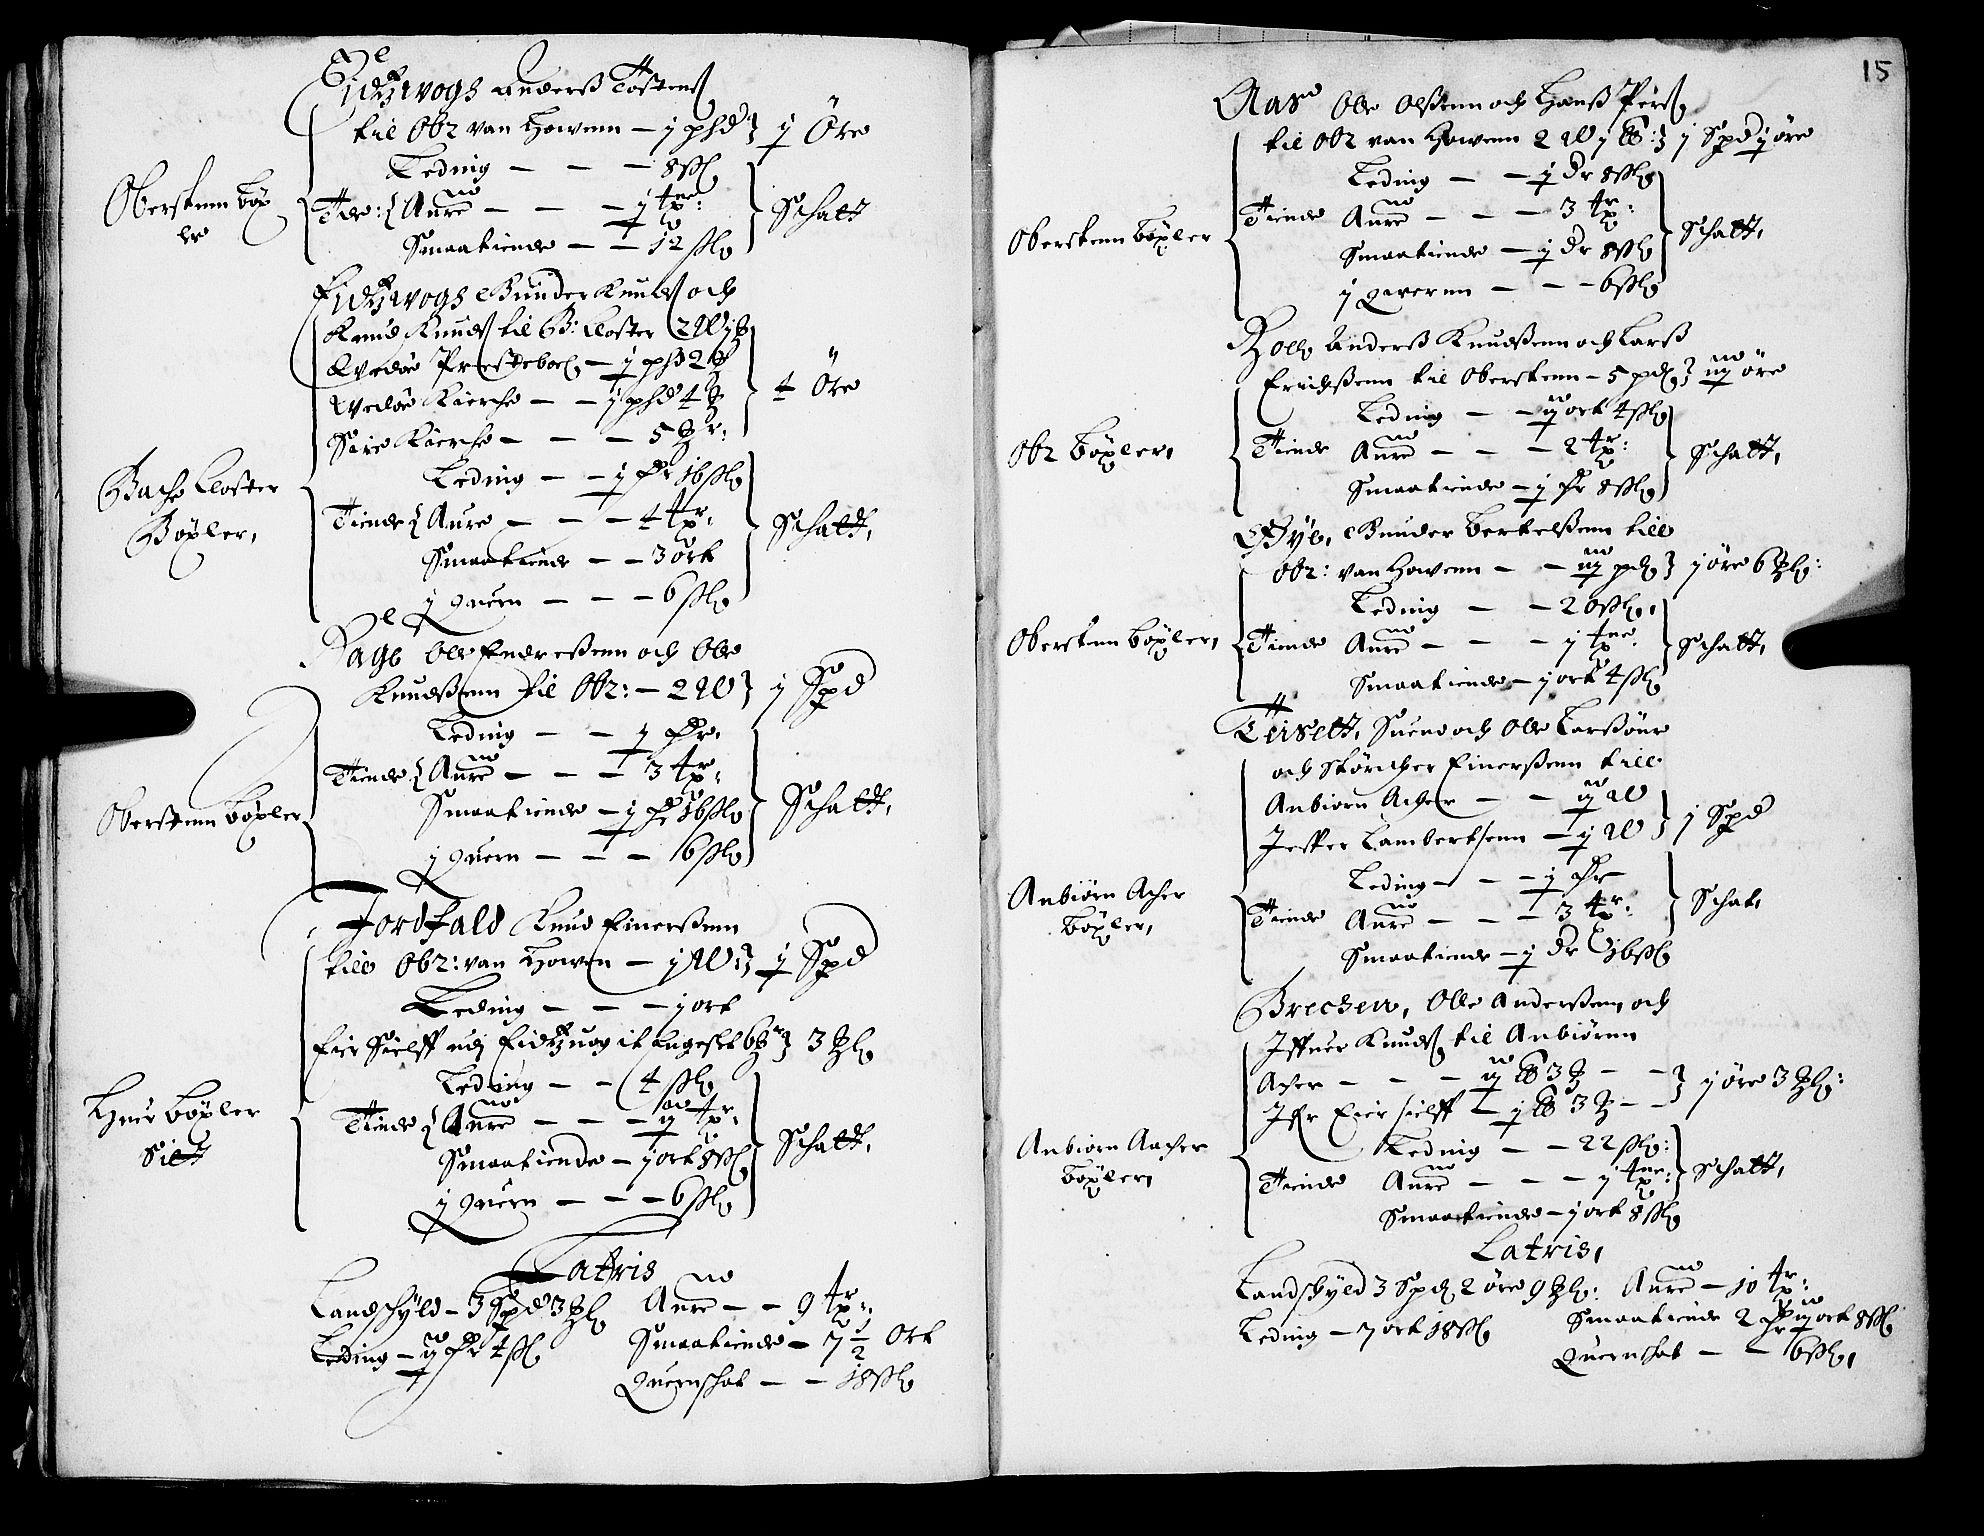 RA, Rentekammeret inntil 1814, Realistisk ordnet avdeling, N/Nb/Nba/L0048: Romsdal fogderi, 1669, s. 18